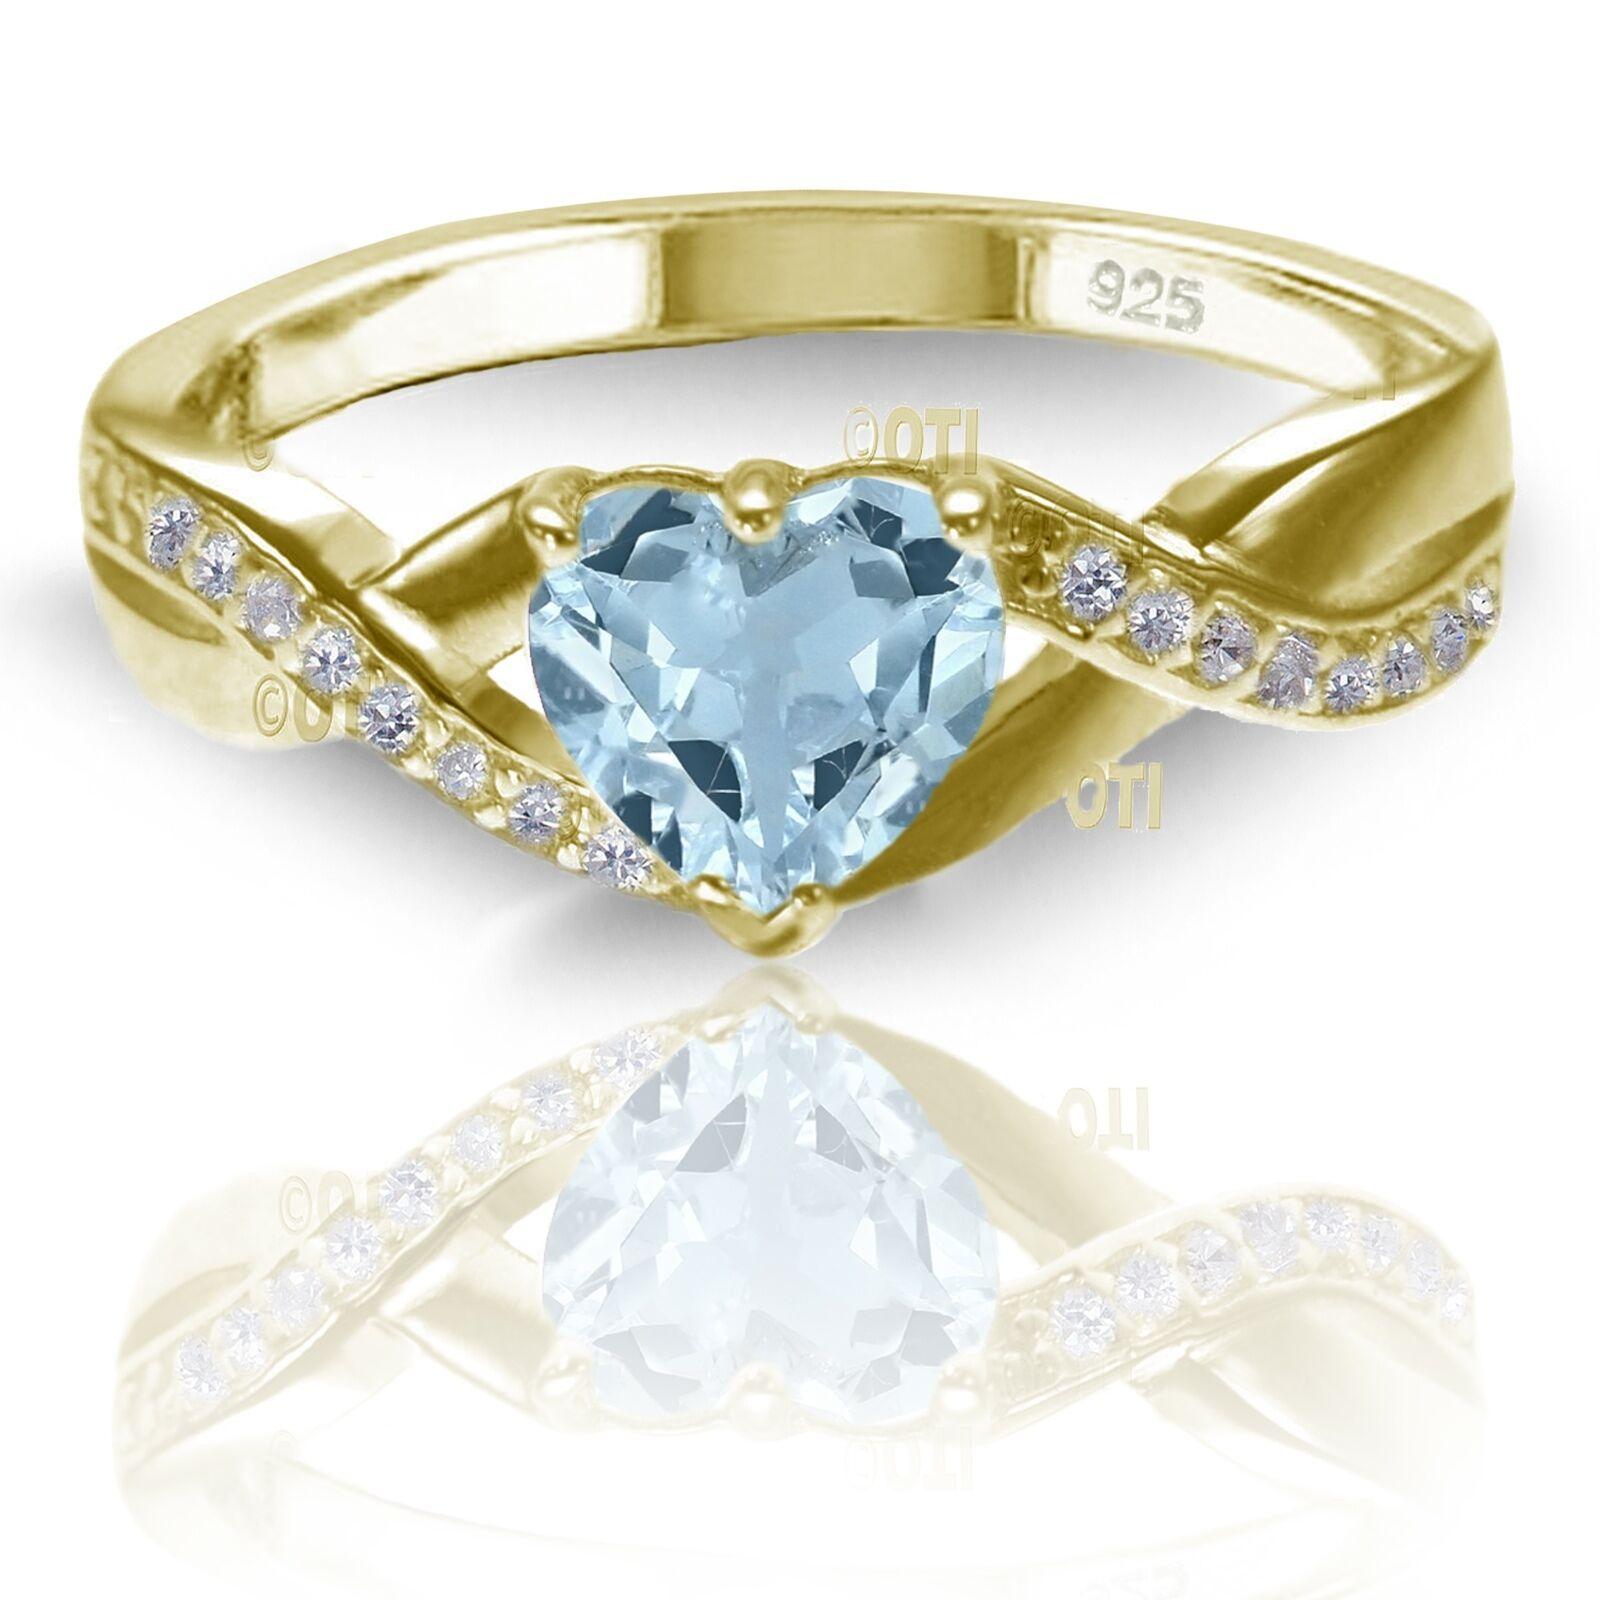 afe489aa4f509 18k Yellow gold Plated Simulated Heart Cut Aquamarine Diamond 925 ...